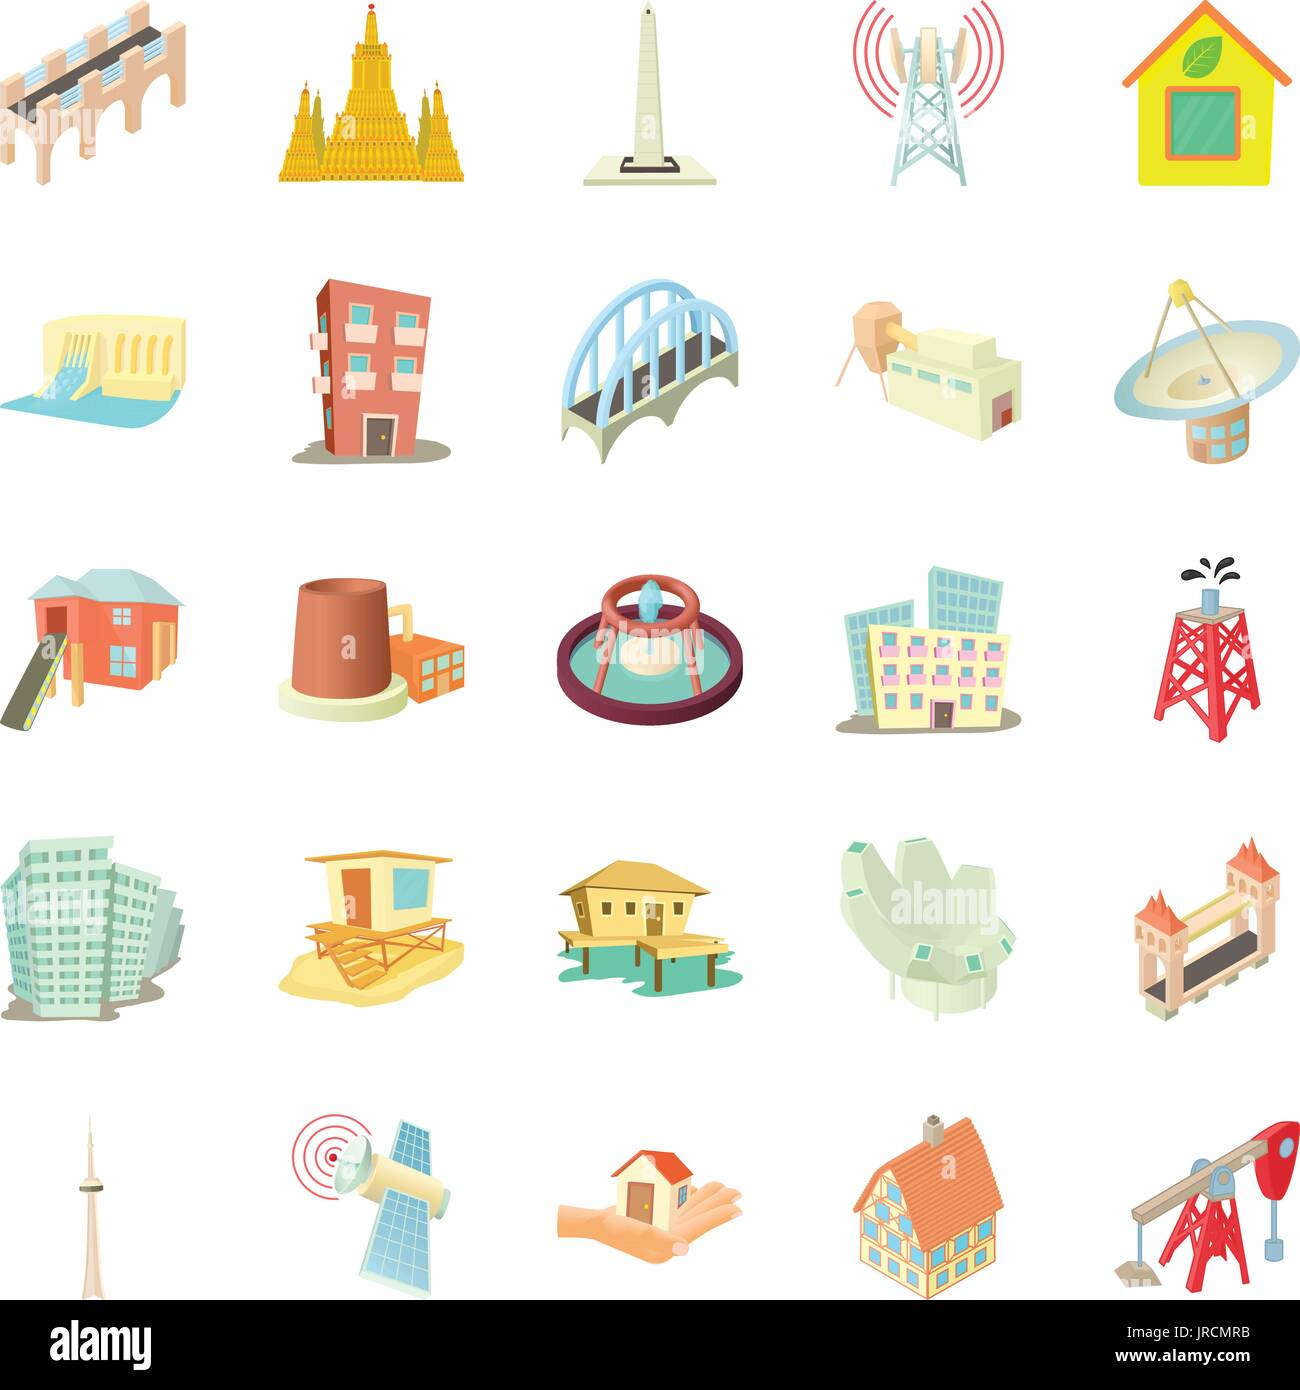 Edifice icons set, cartoon style - Stock Image